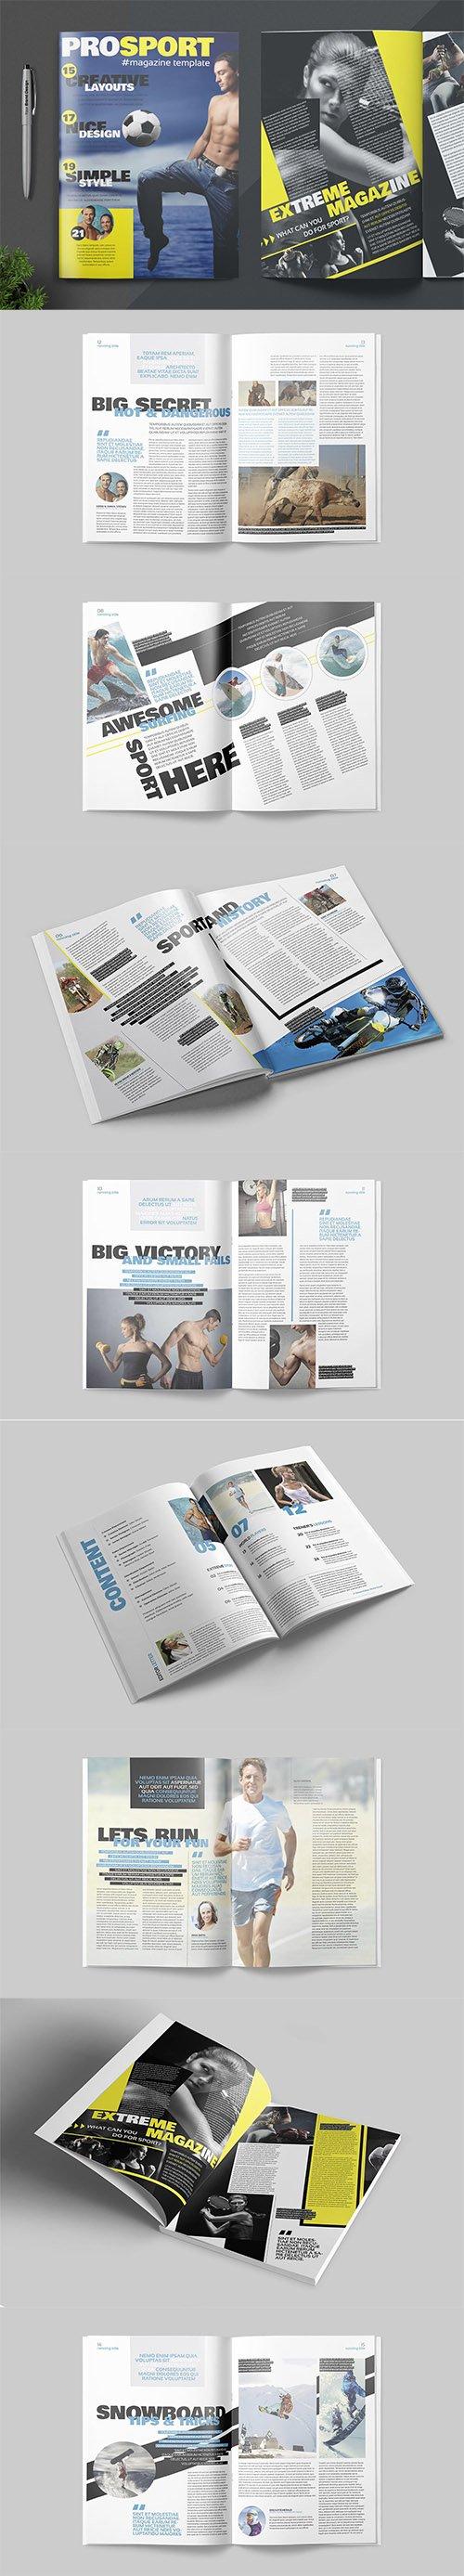 Magazine Template - Prosport